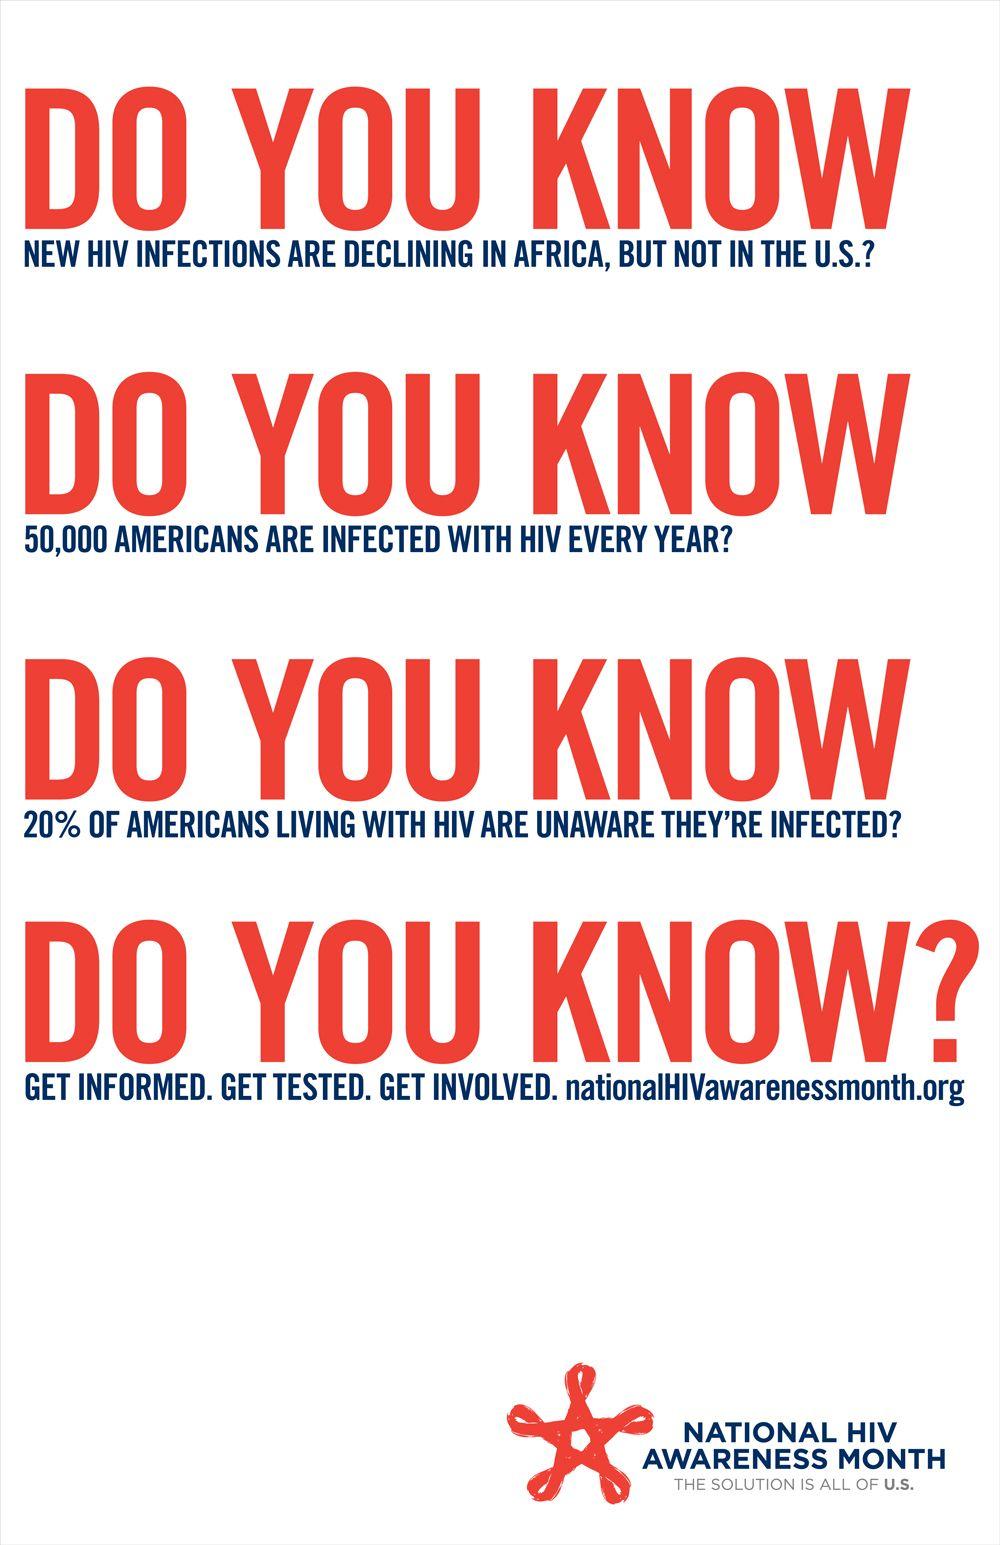 Pin on HIV/AIDS awareness